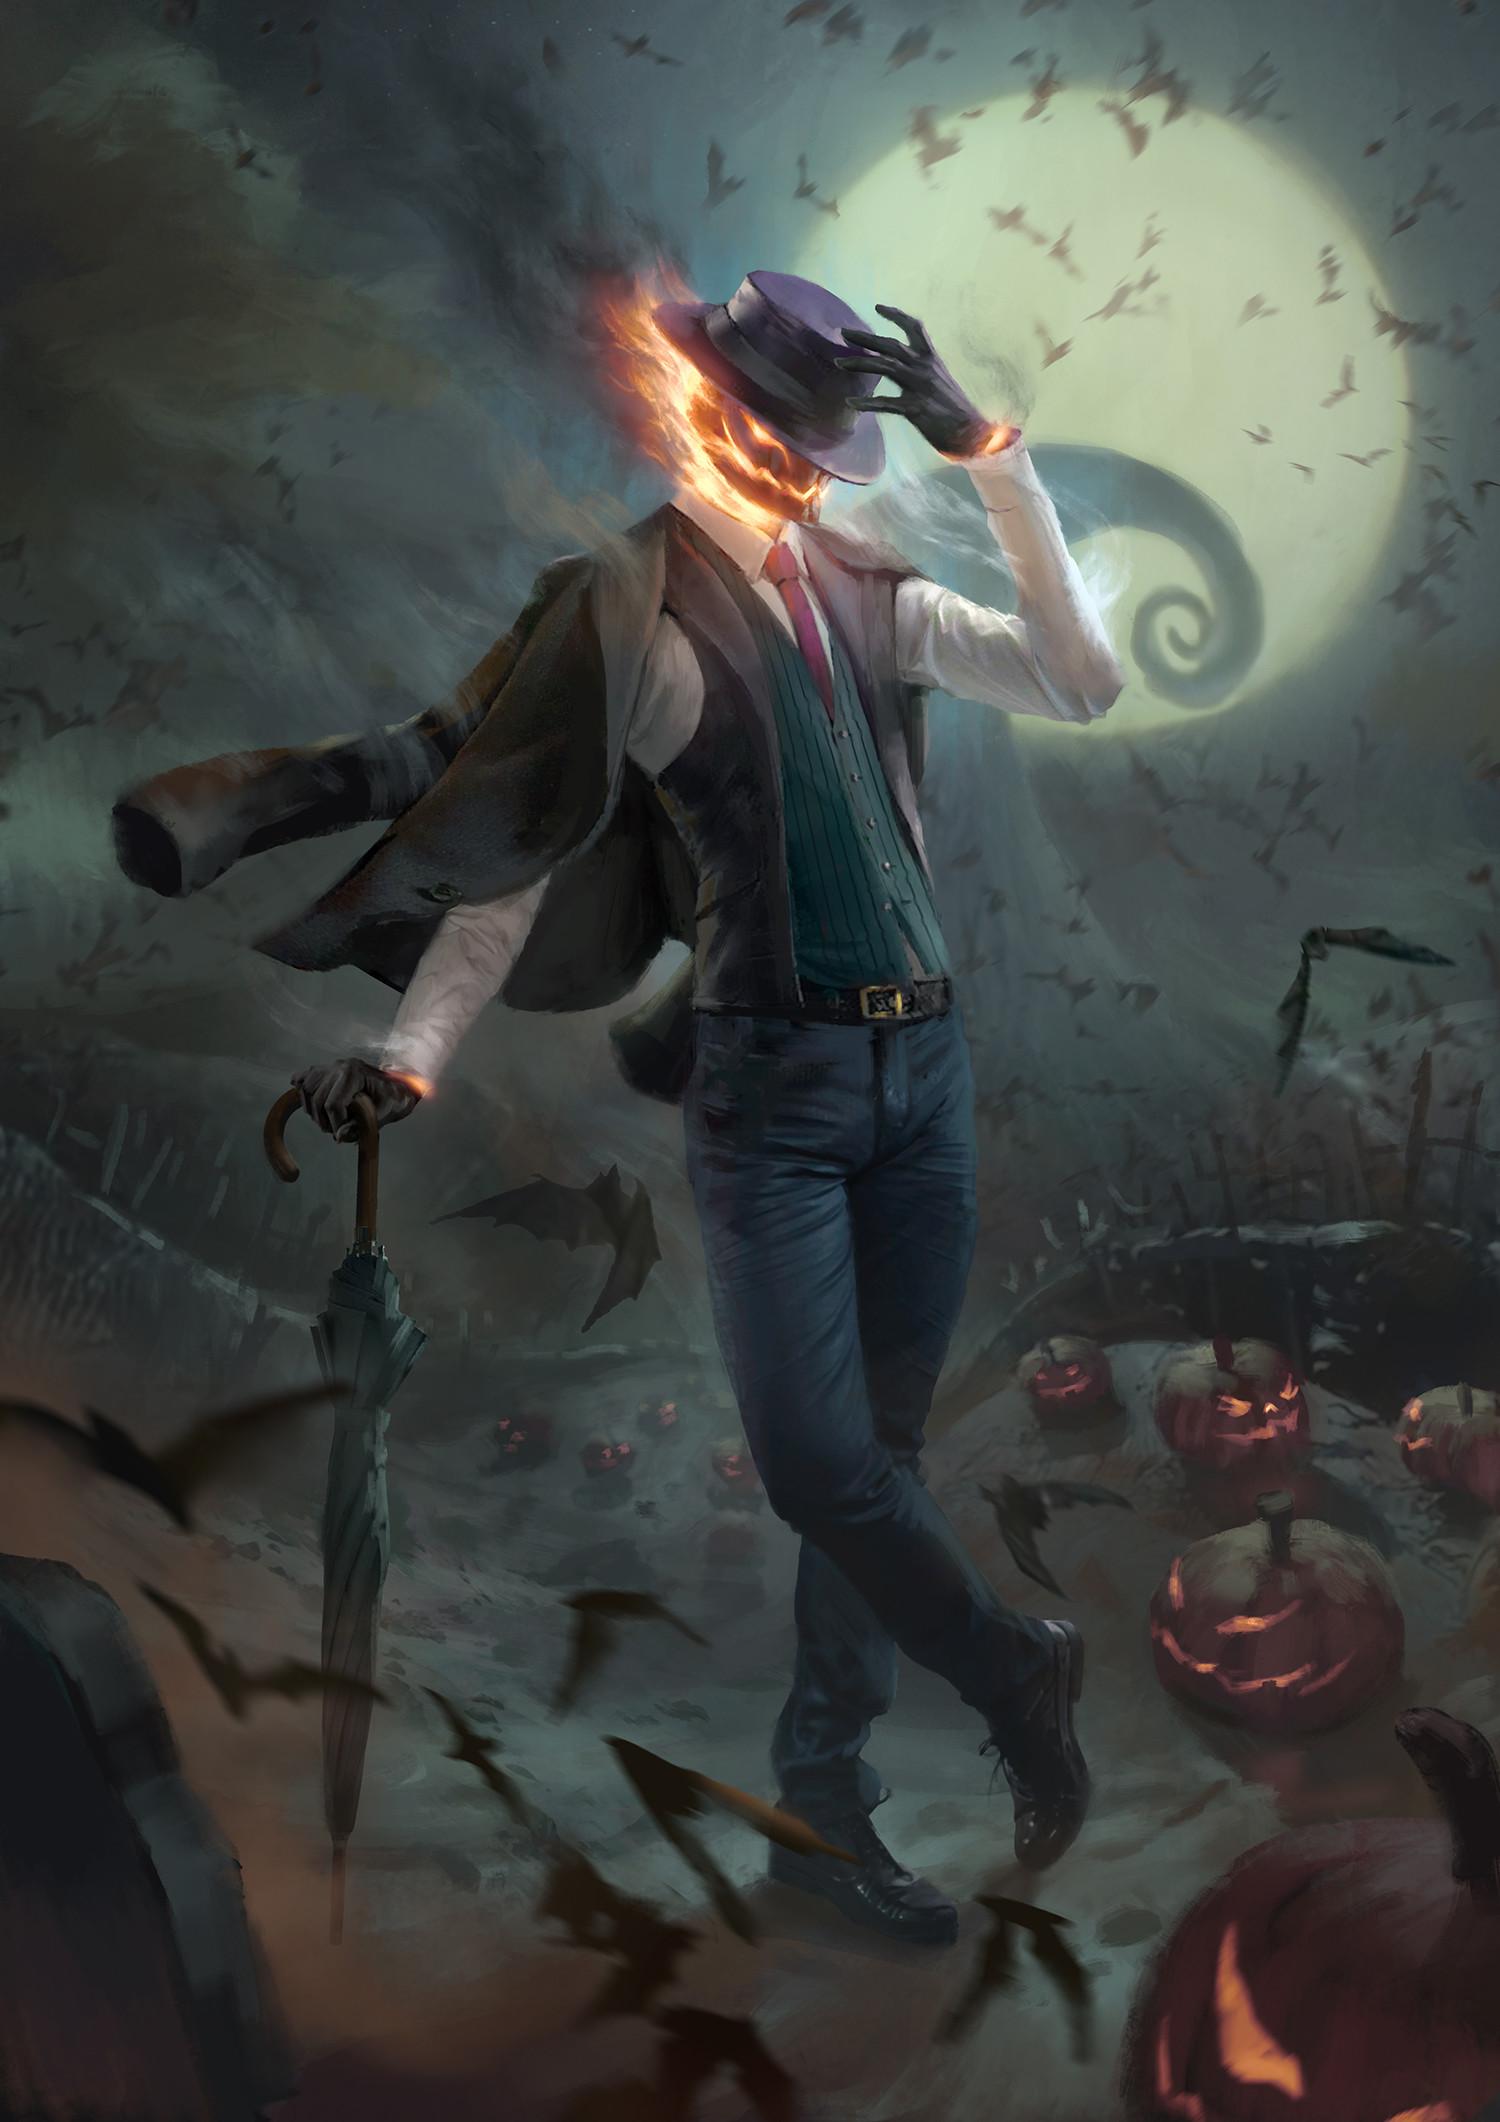 ArtStation - Spooky Jack O' Lantern 2, Billy Christian